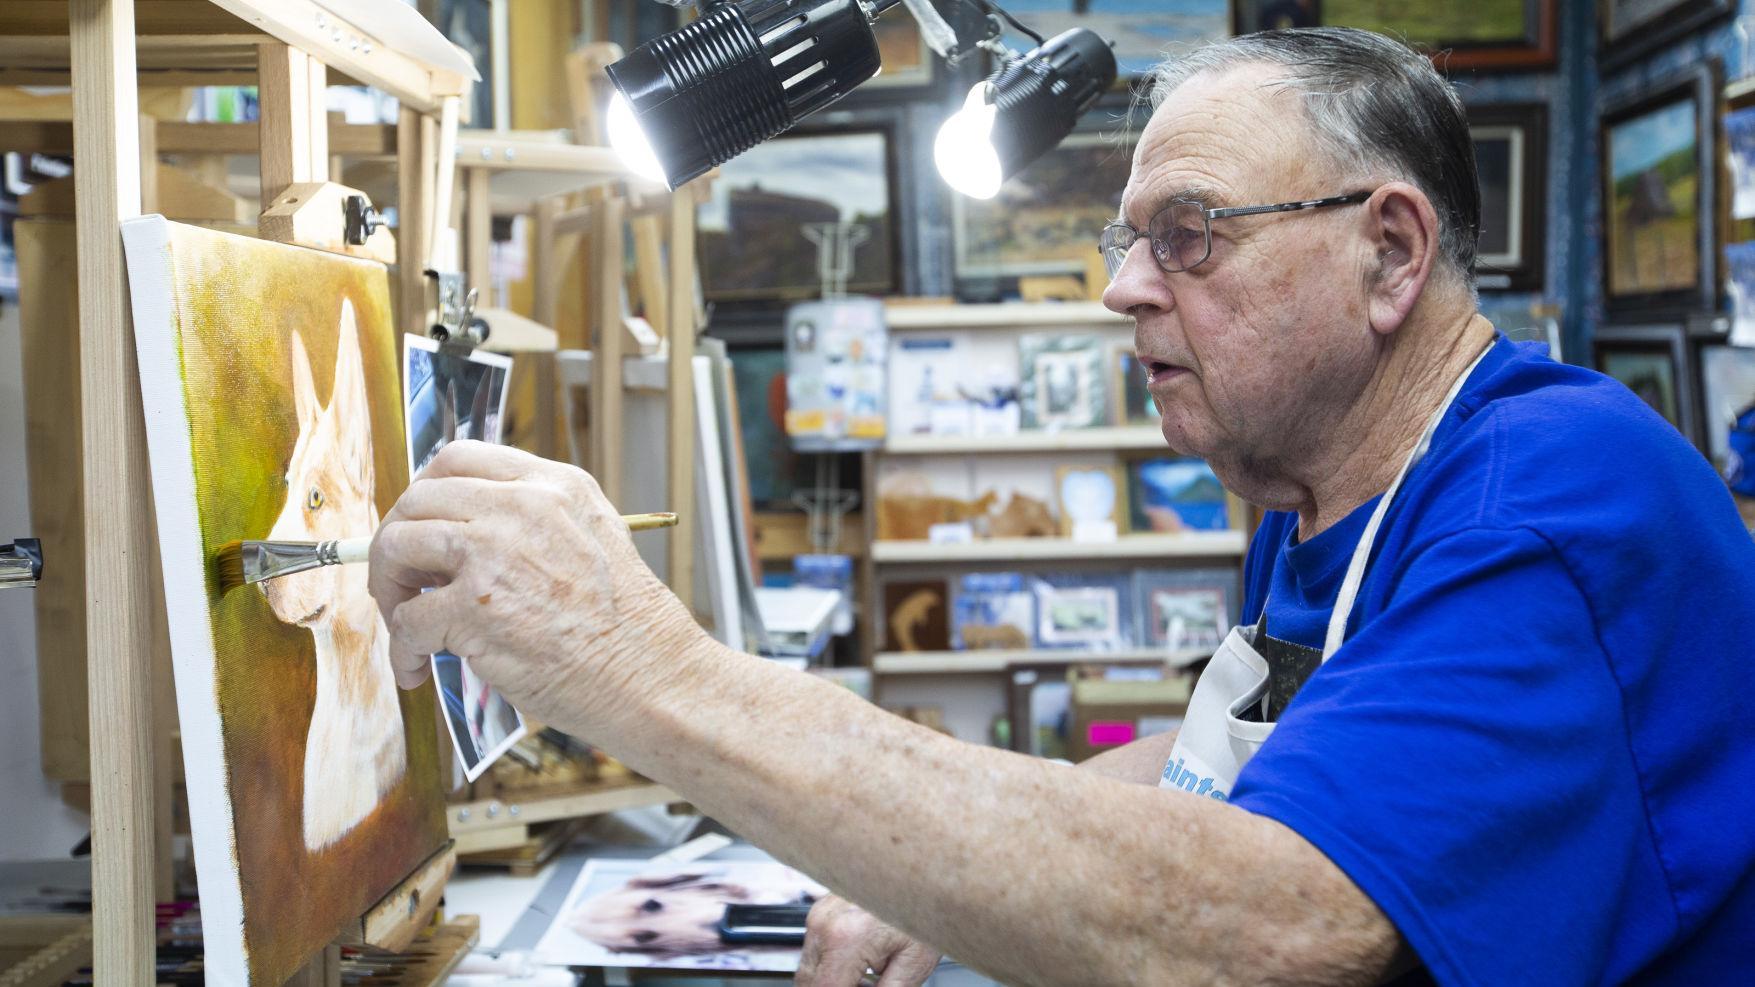 Yakima S Bill Carnahan Finds A Niche Painting Pet Portraits Local Yakimaherald Com